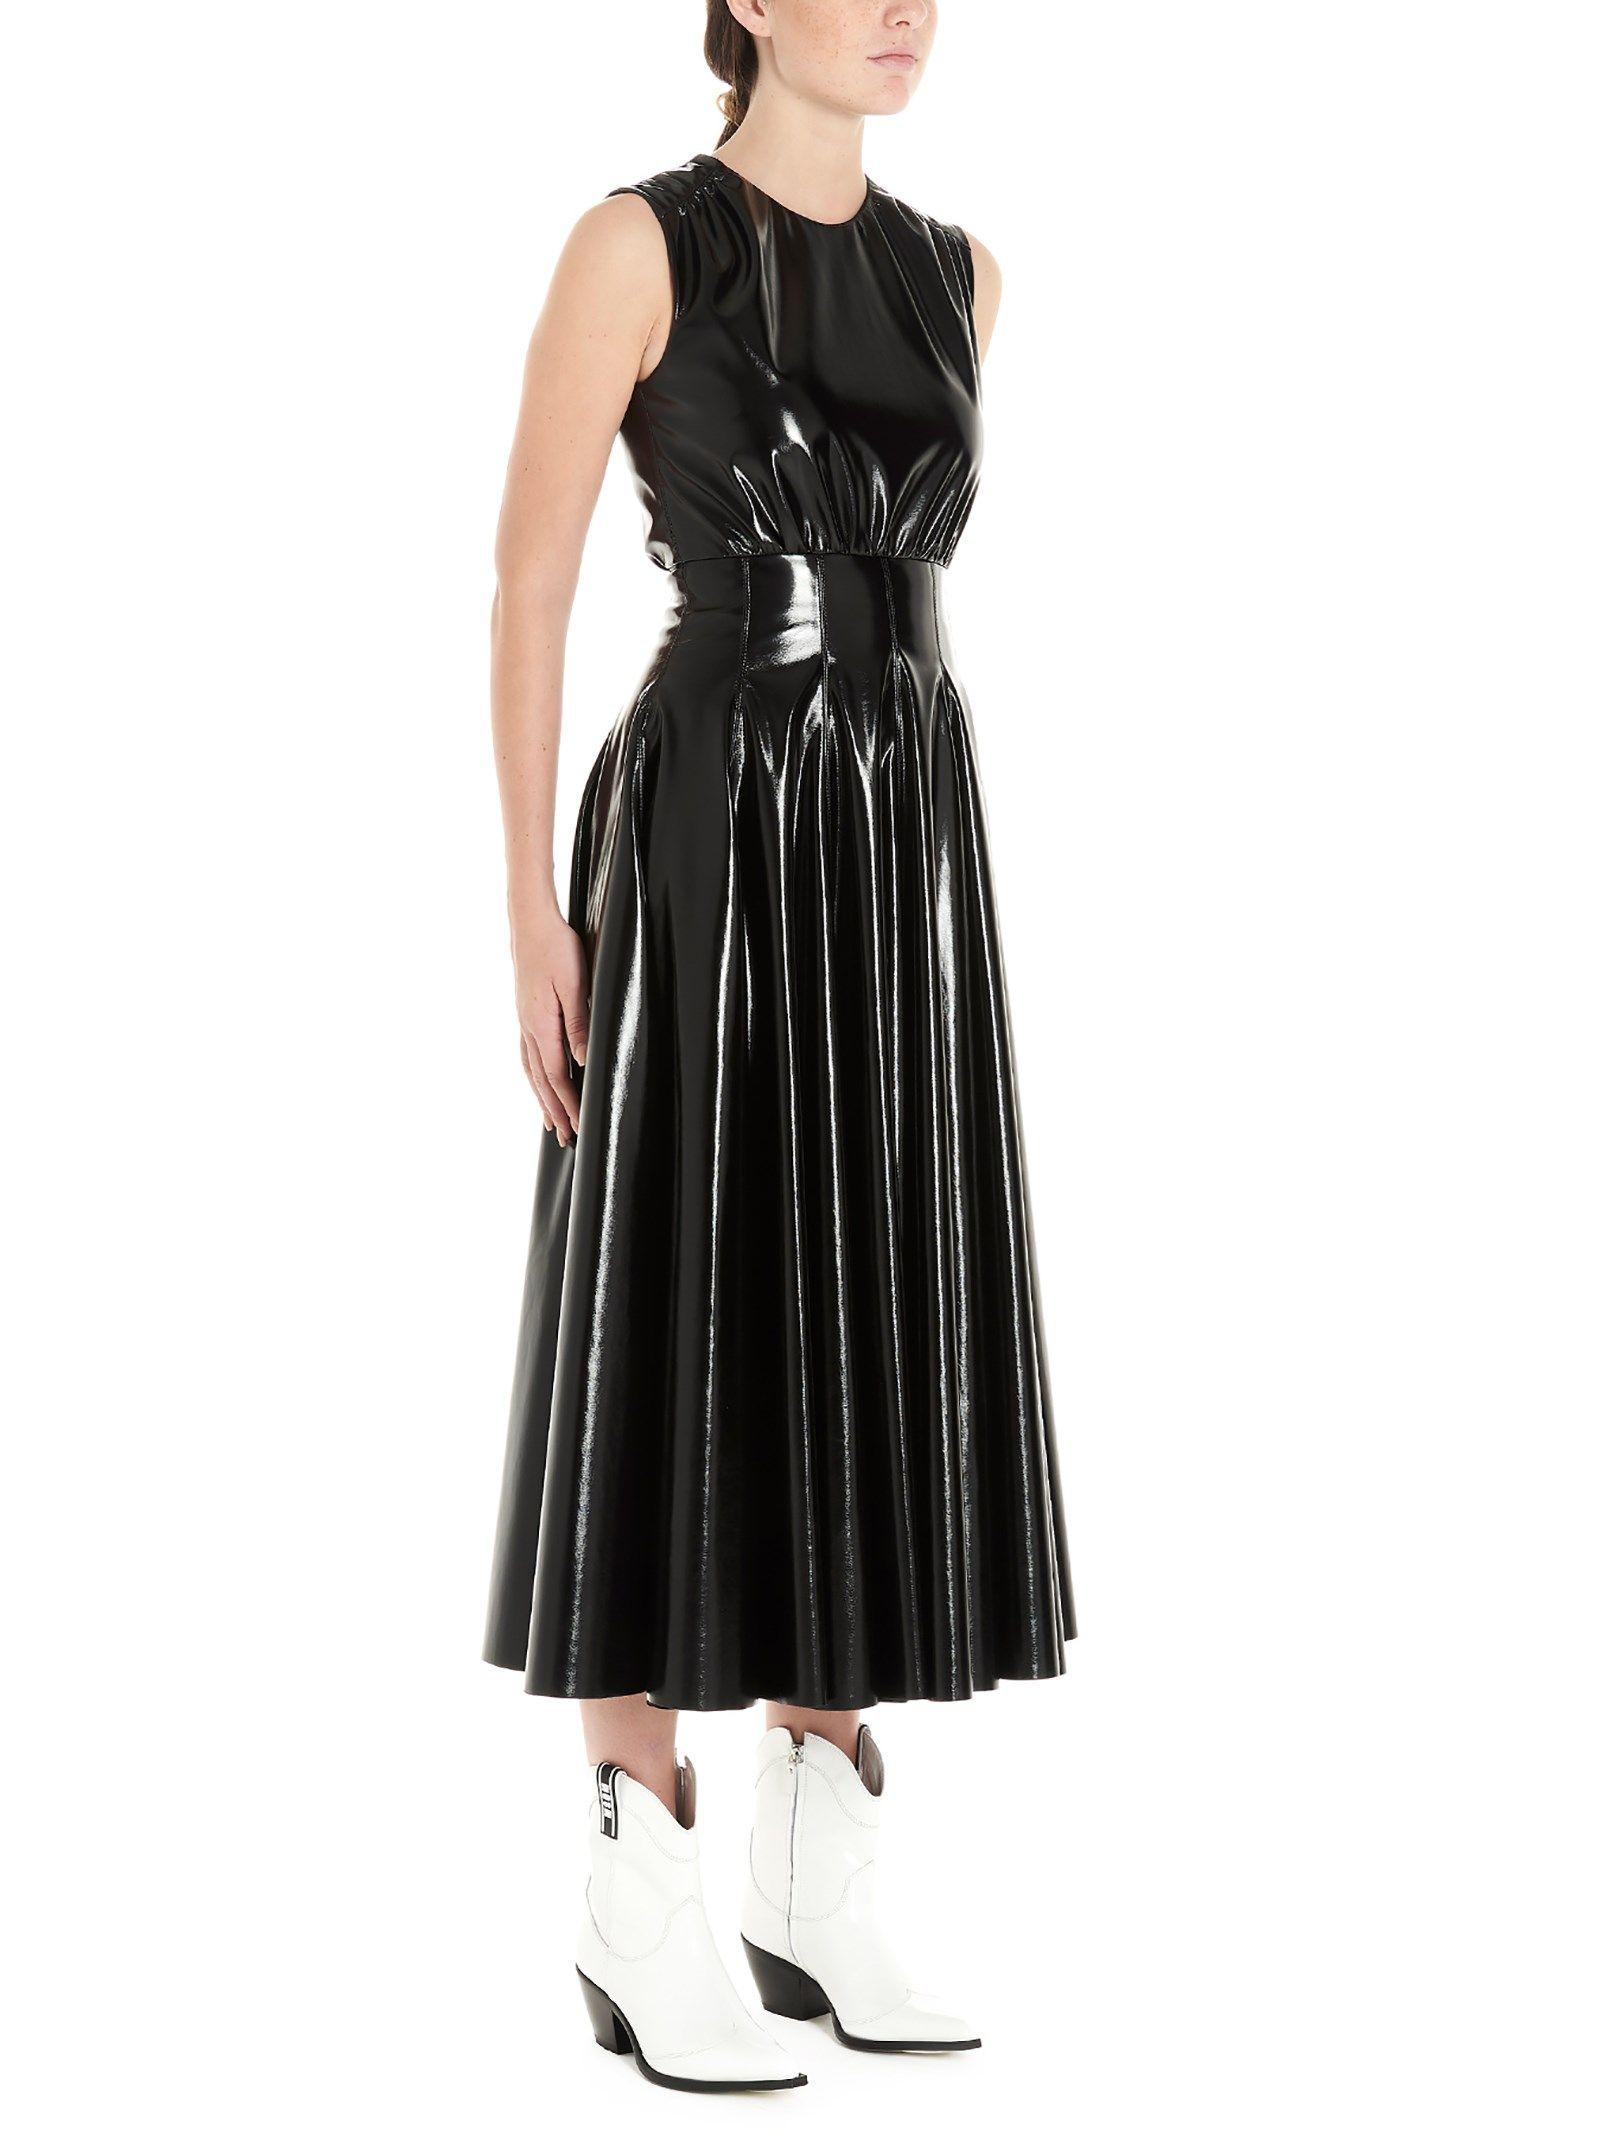 MSGM WOMEN'S 2741MDA2319561599 BLACK POLYESTER DRESS